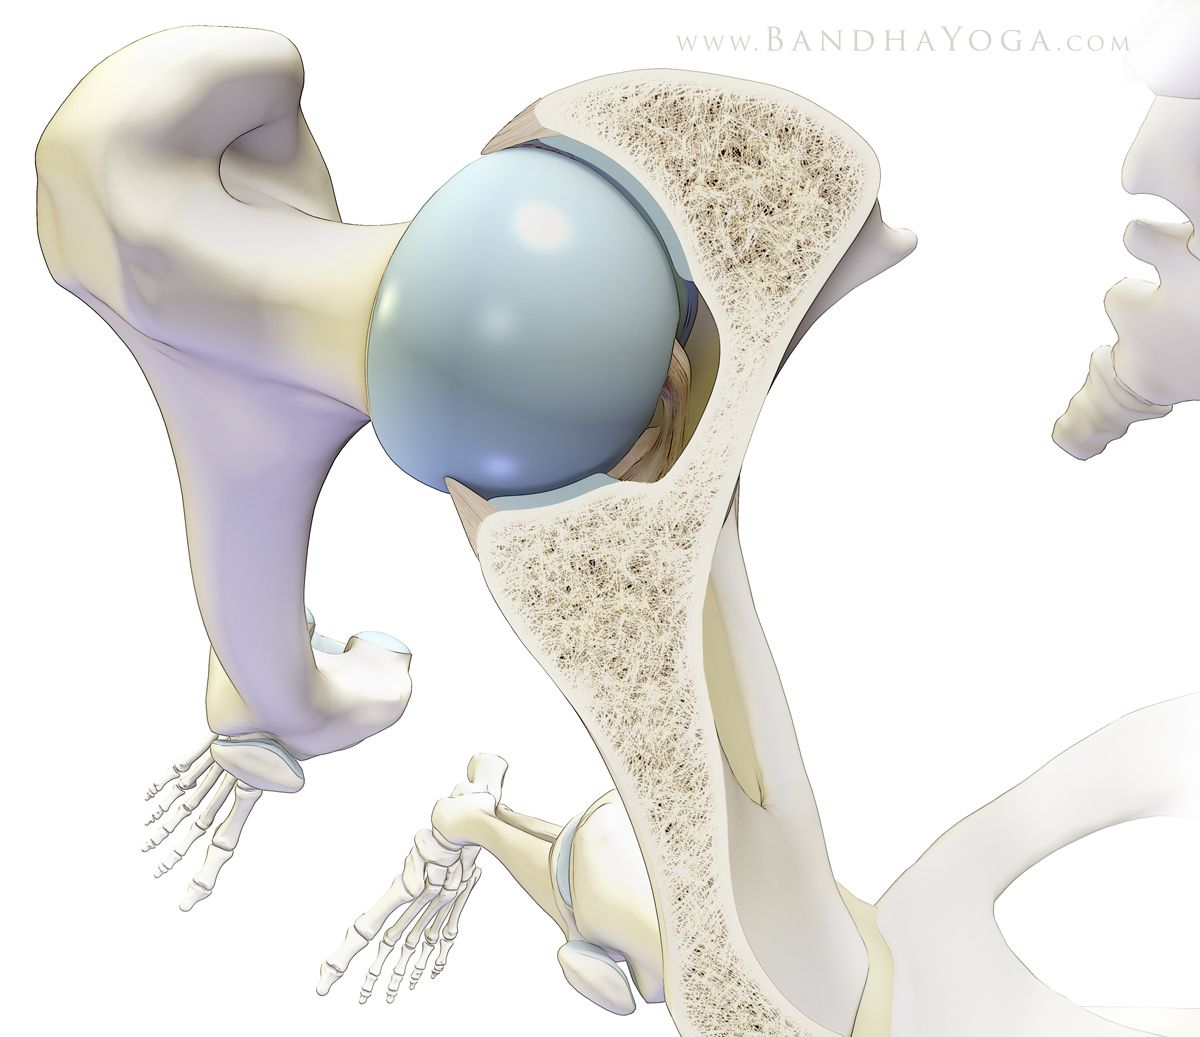 Preventing Yoga Injuries vs Preventing Yoga, Part I The